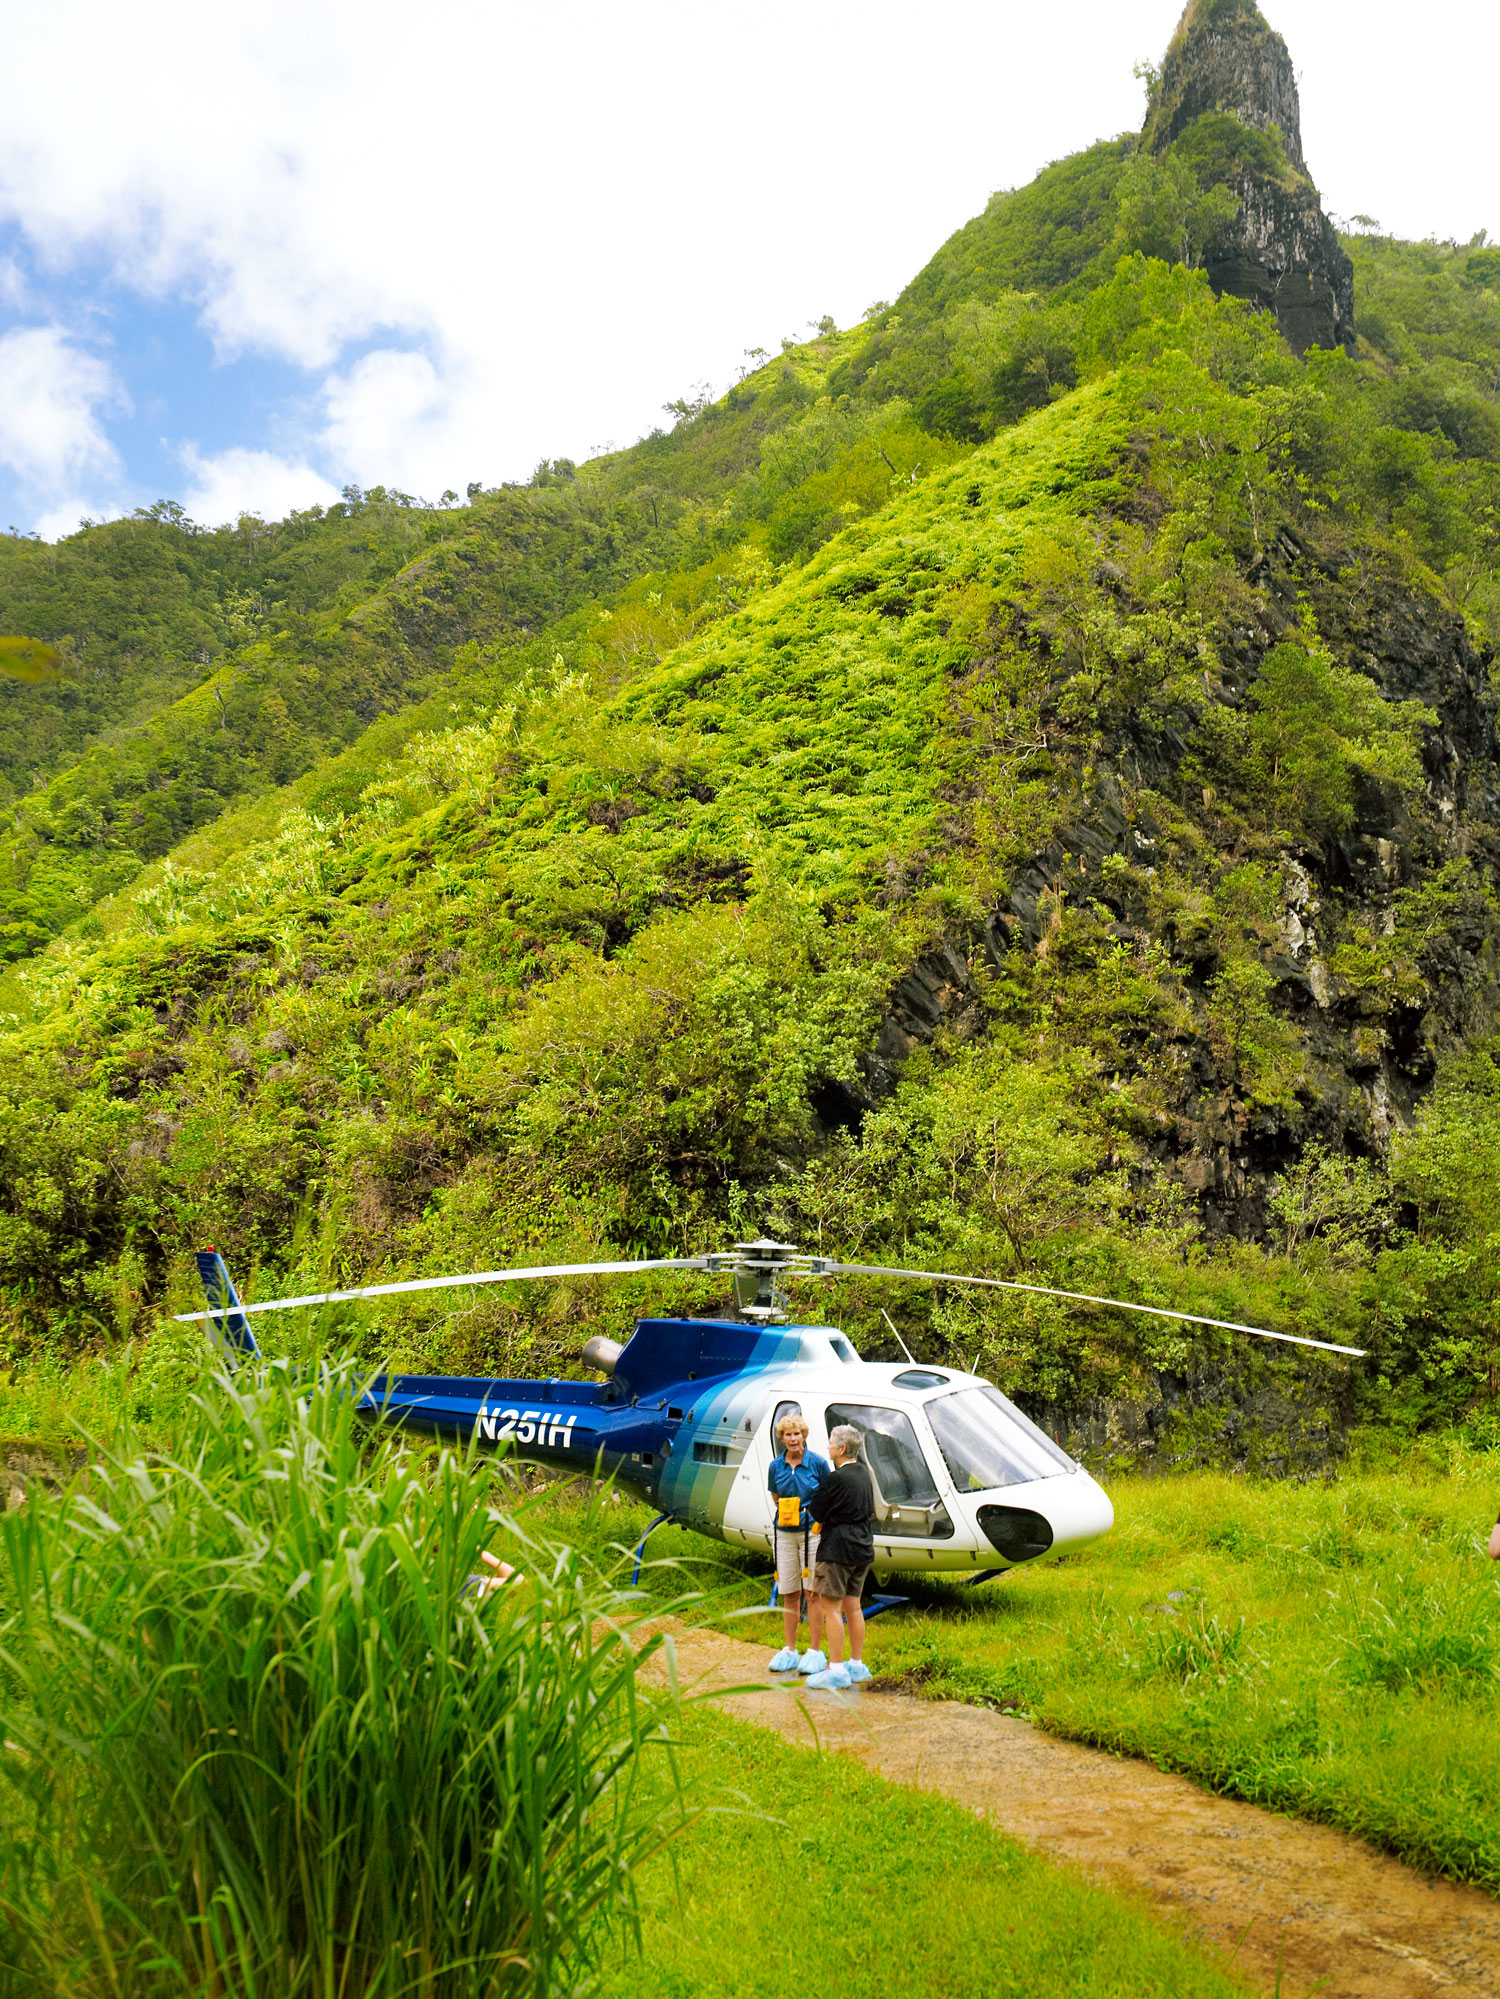 Island Helicopters' Jurassic Falls Landing Adventure